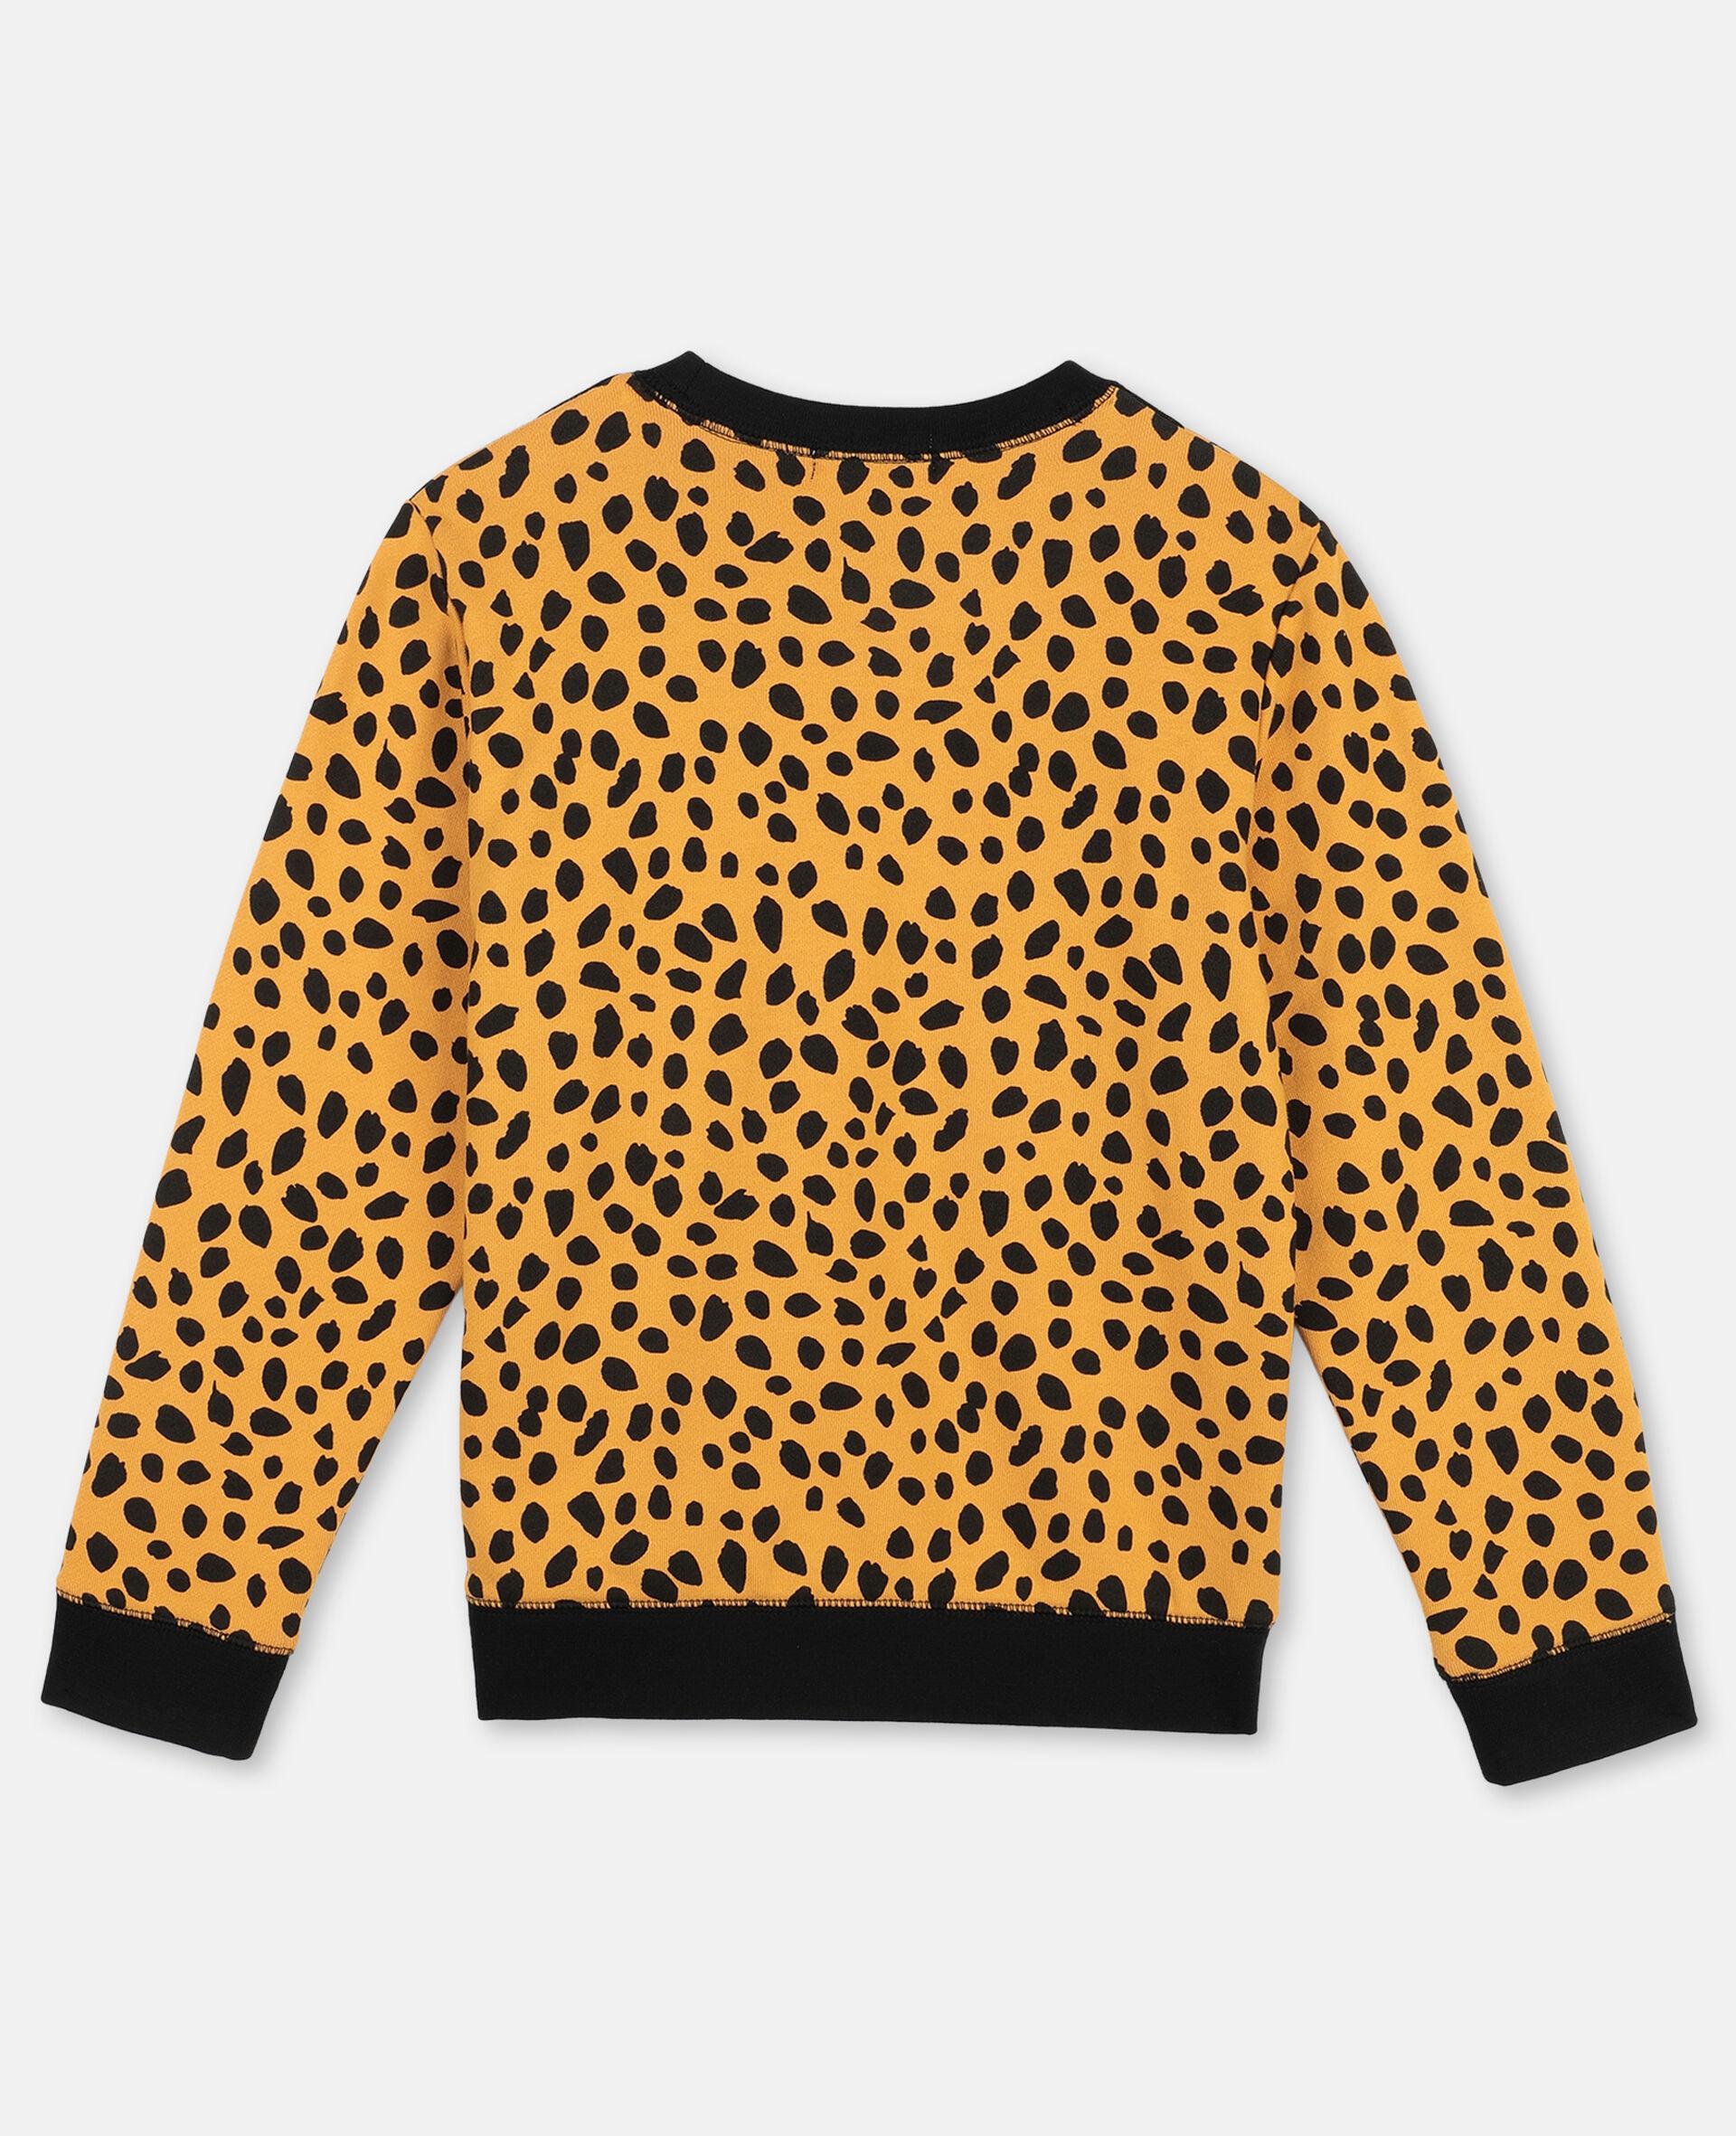 Cheetah Dots棉质抓绒卫衣 -Multicolored-large image number 3